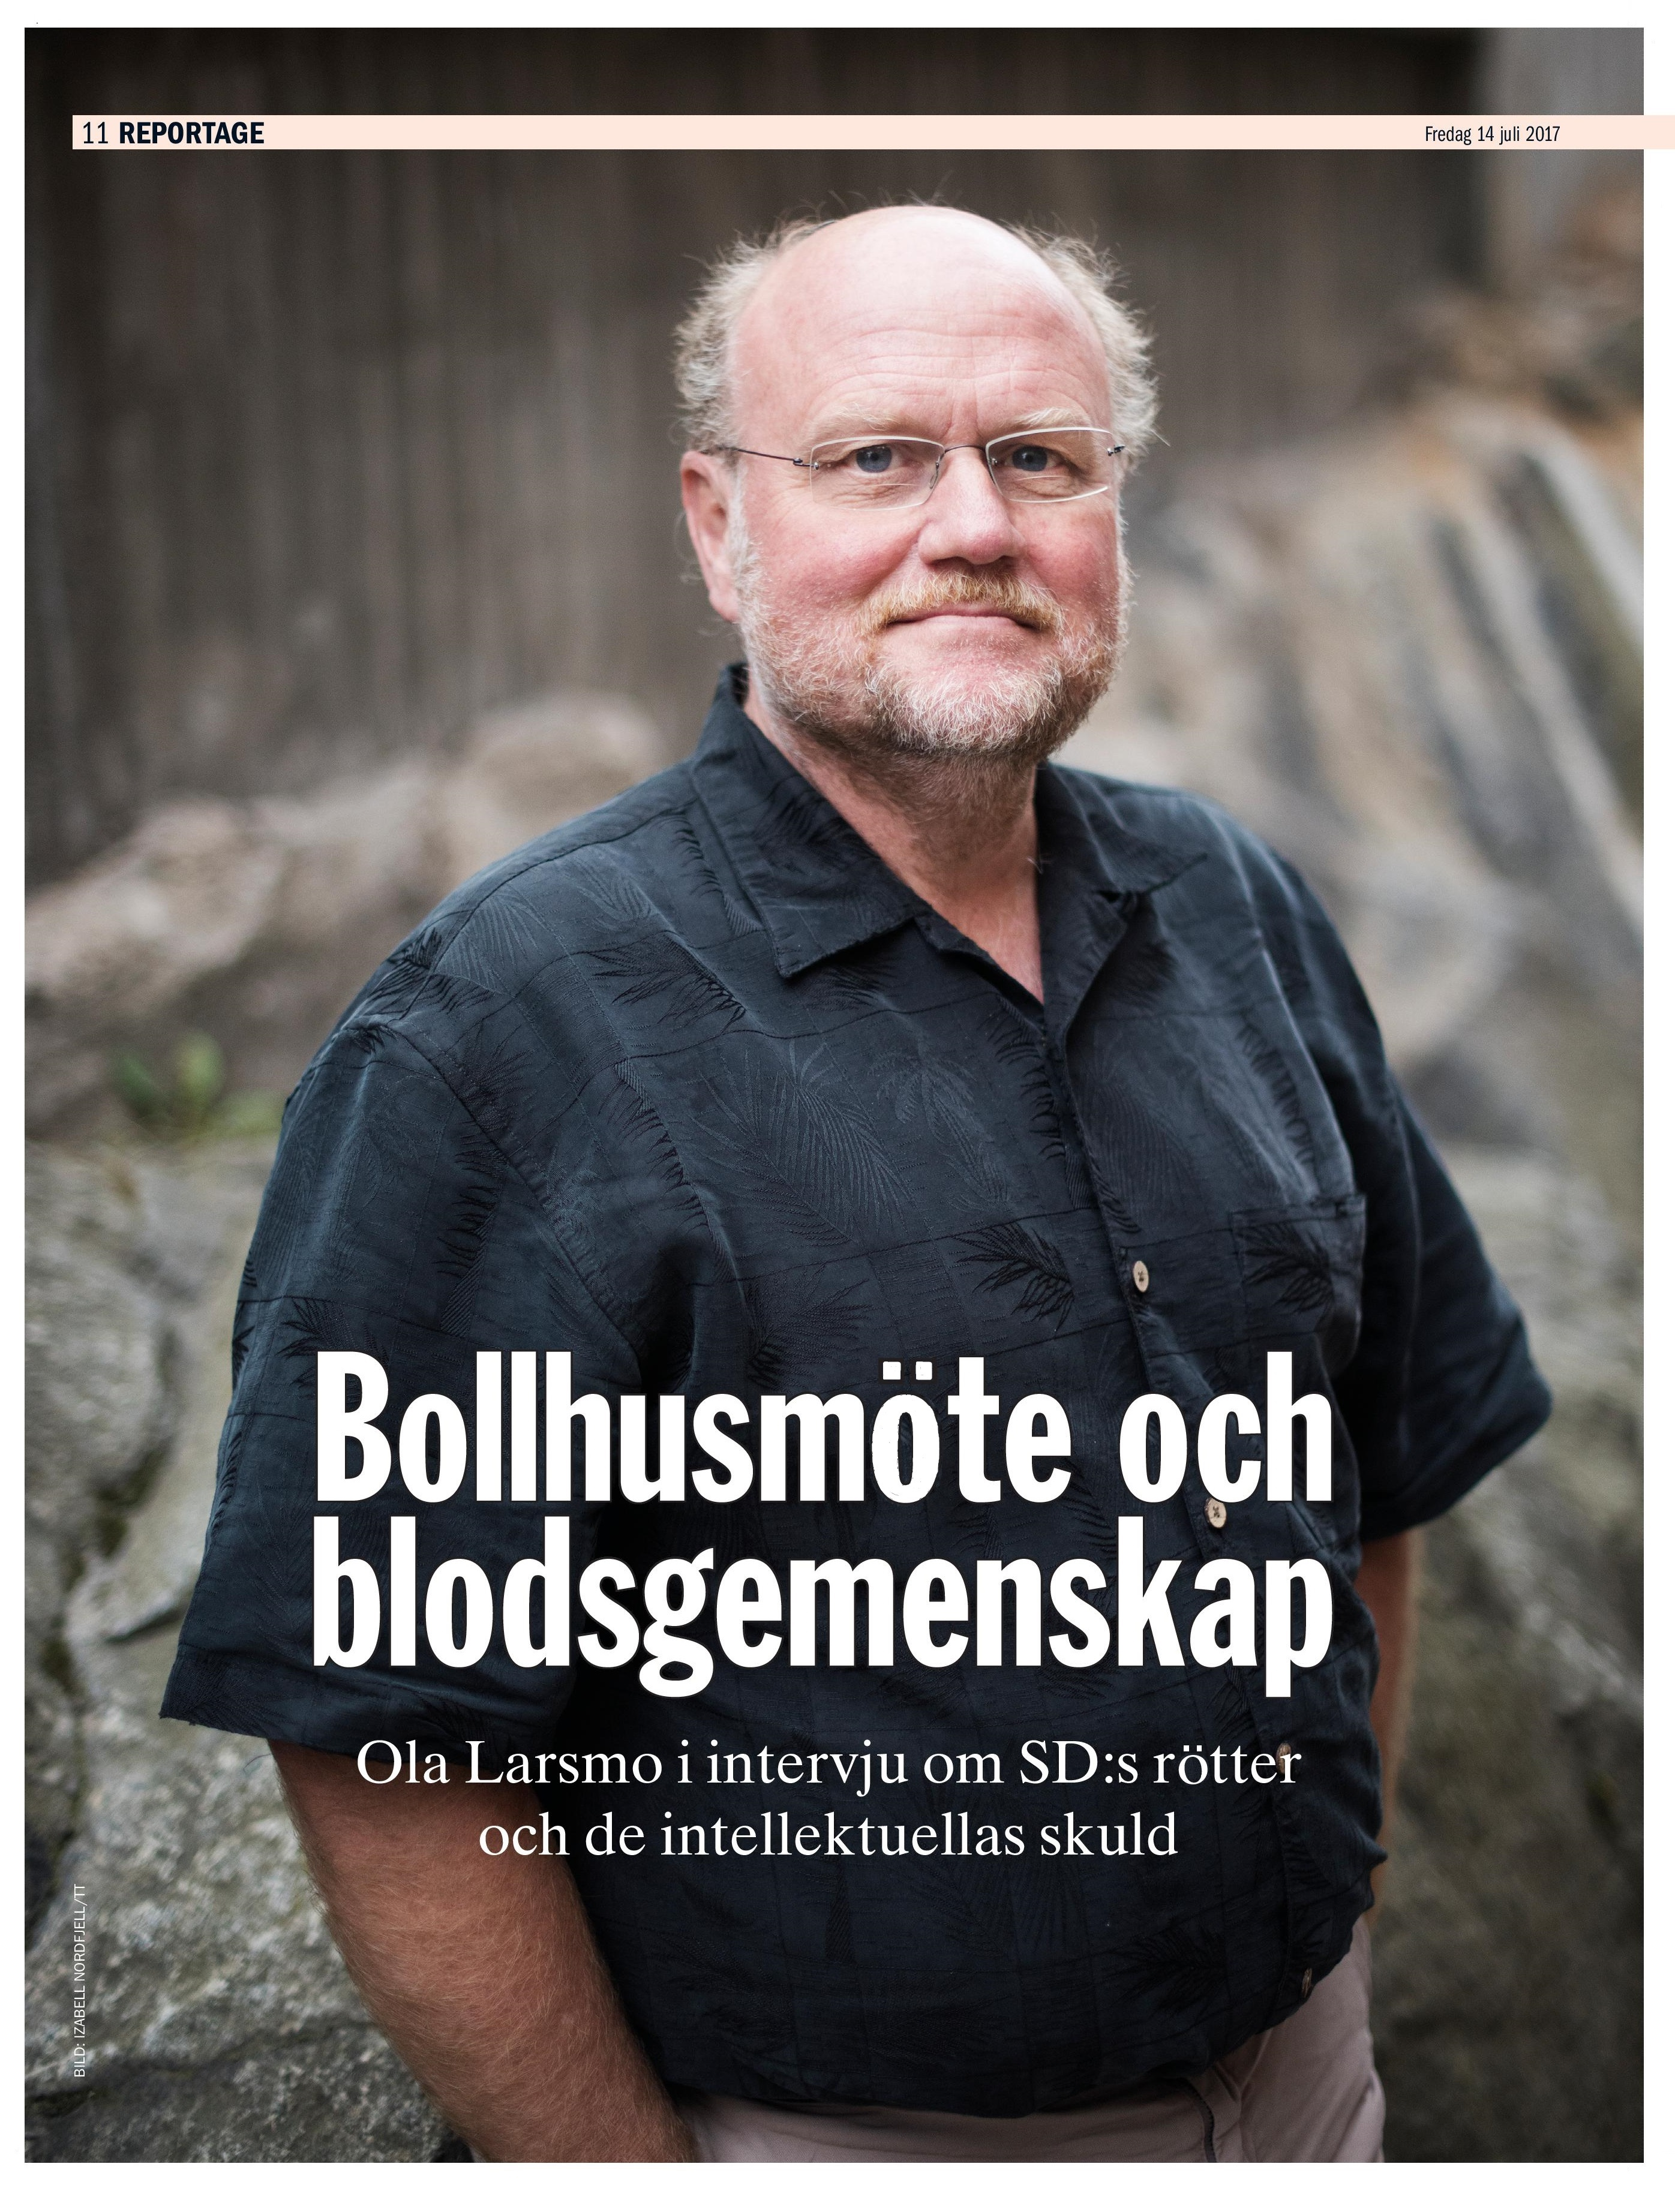 Ola Larsmo, ETC Uppsala 2017-07-14